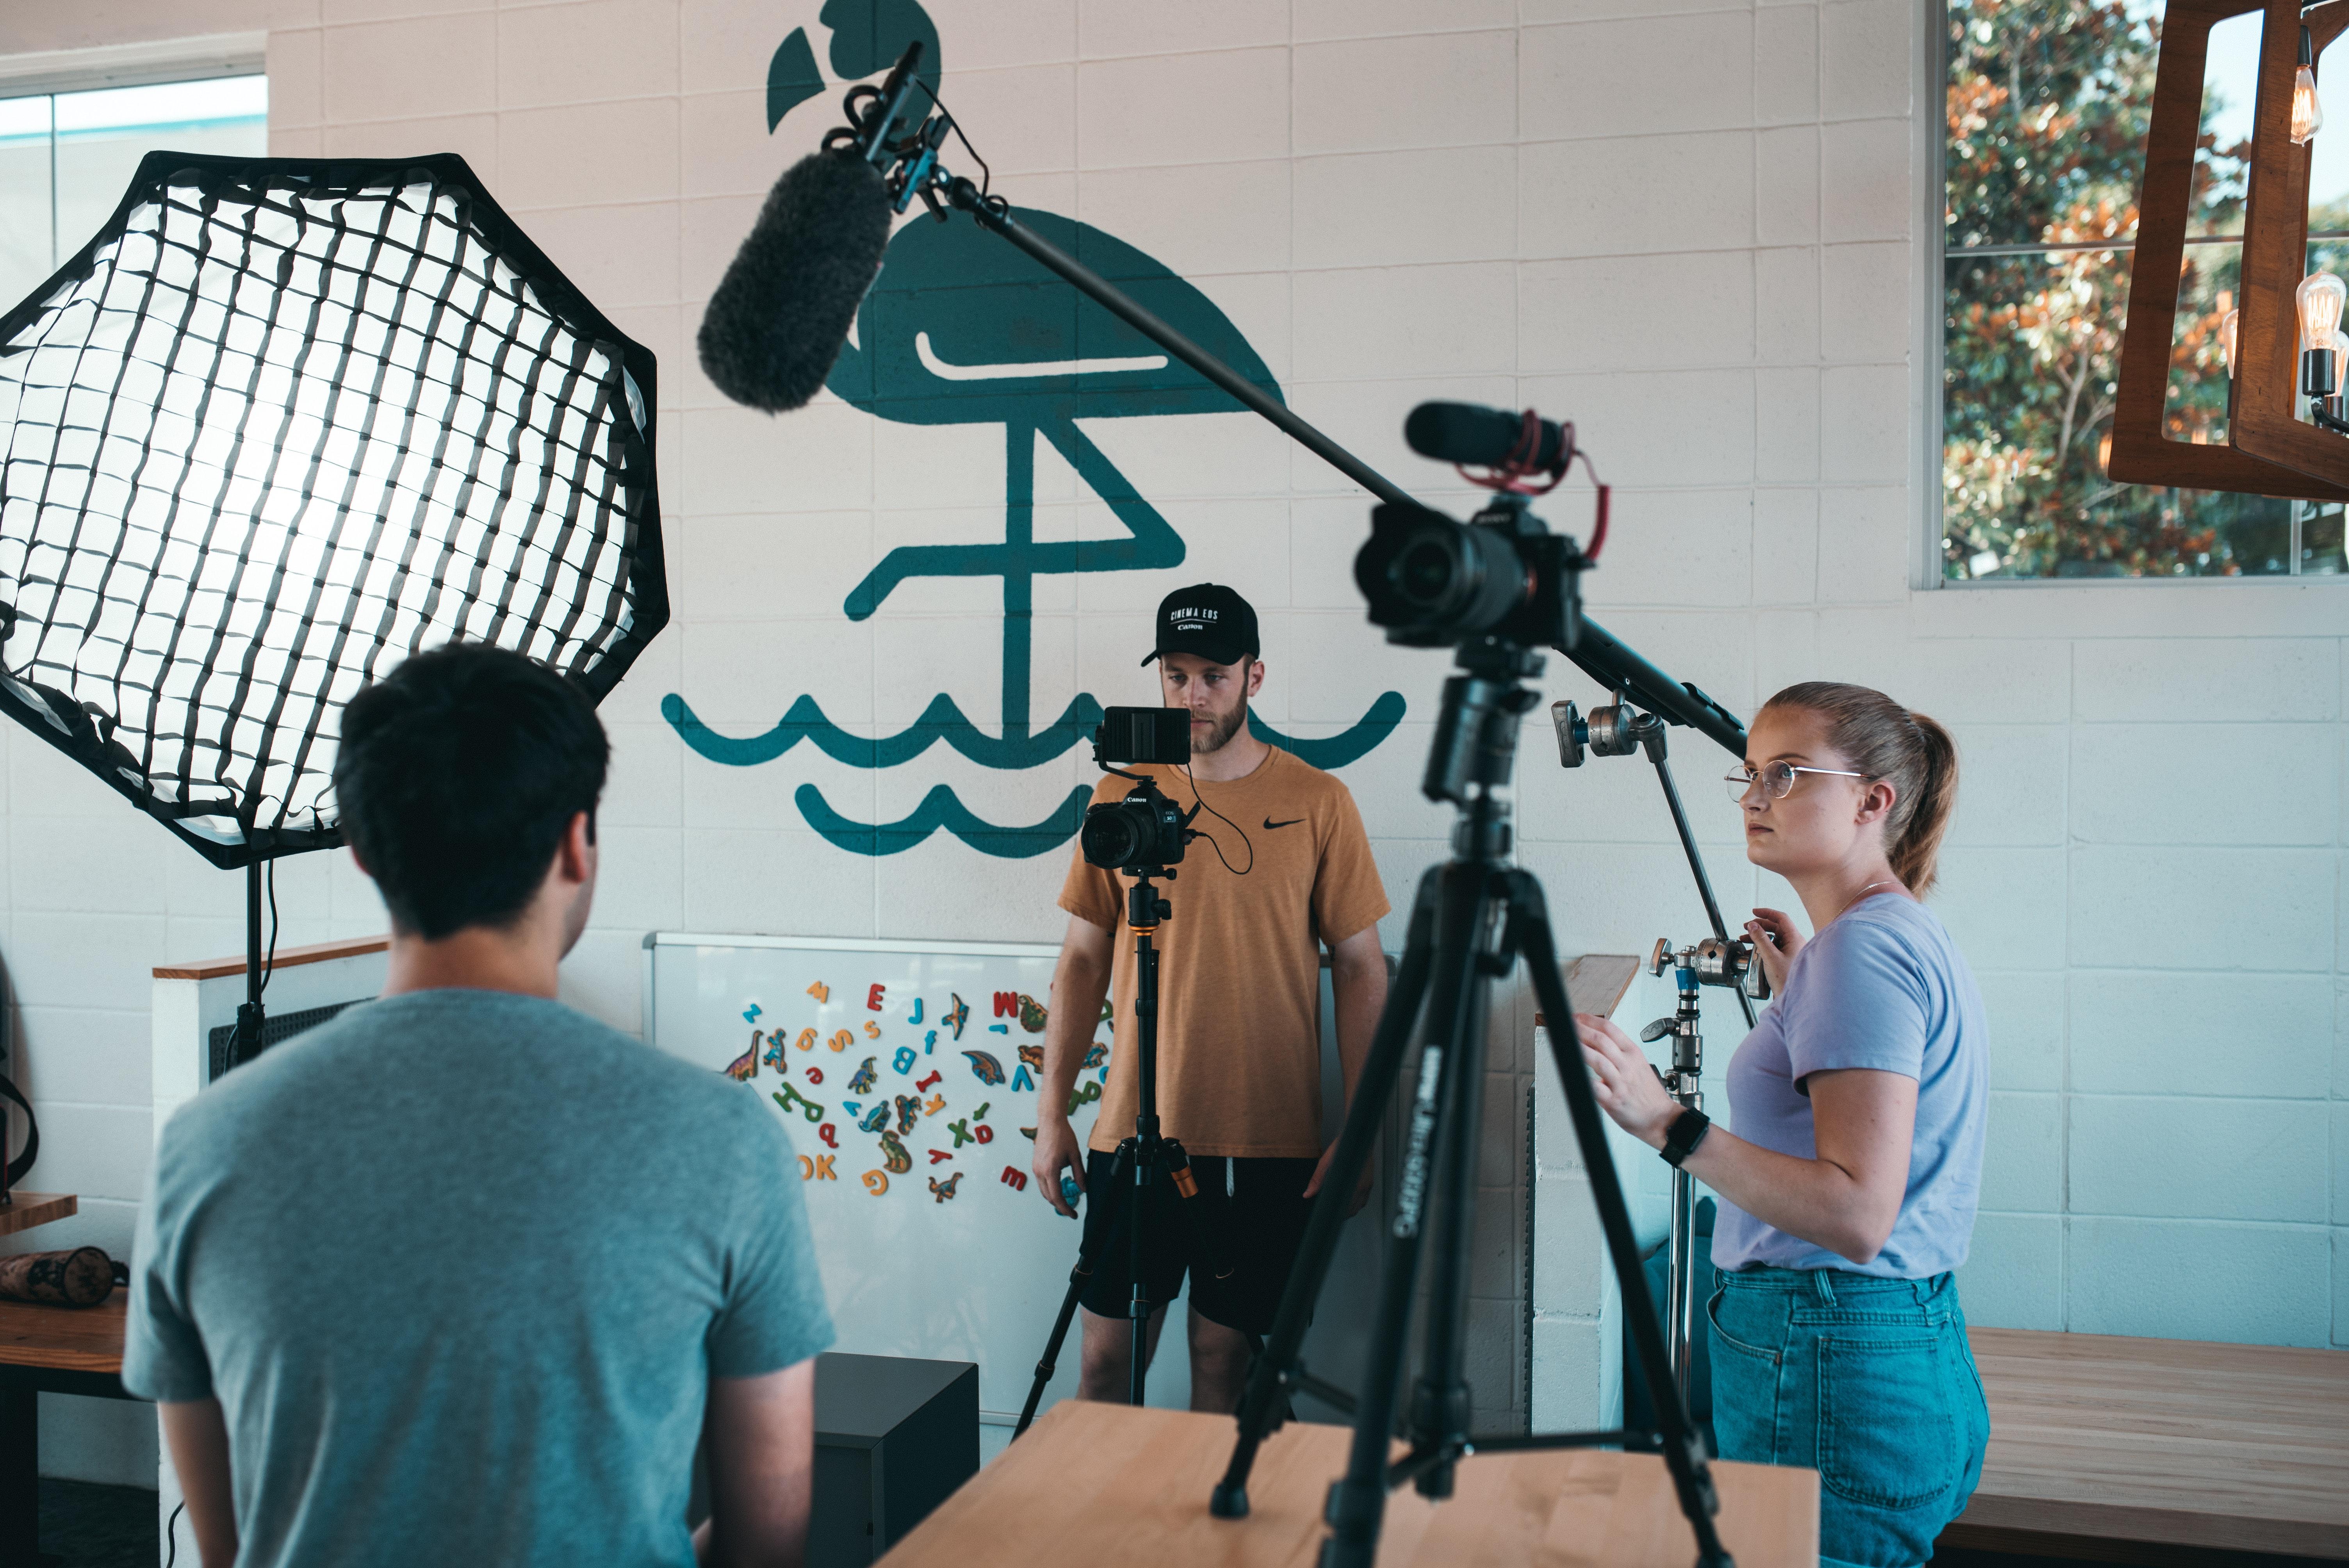 production-action-camera-camera-crew